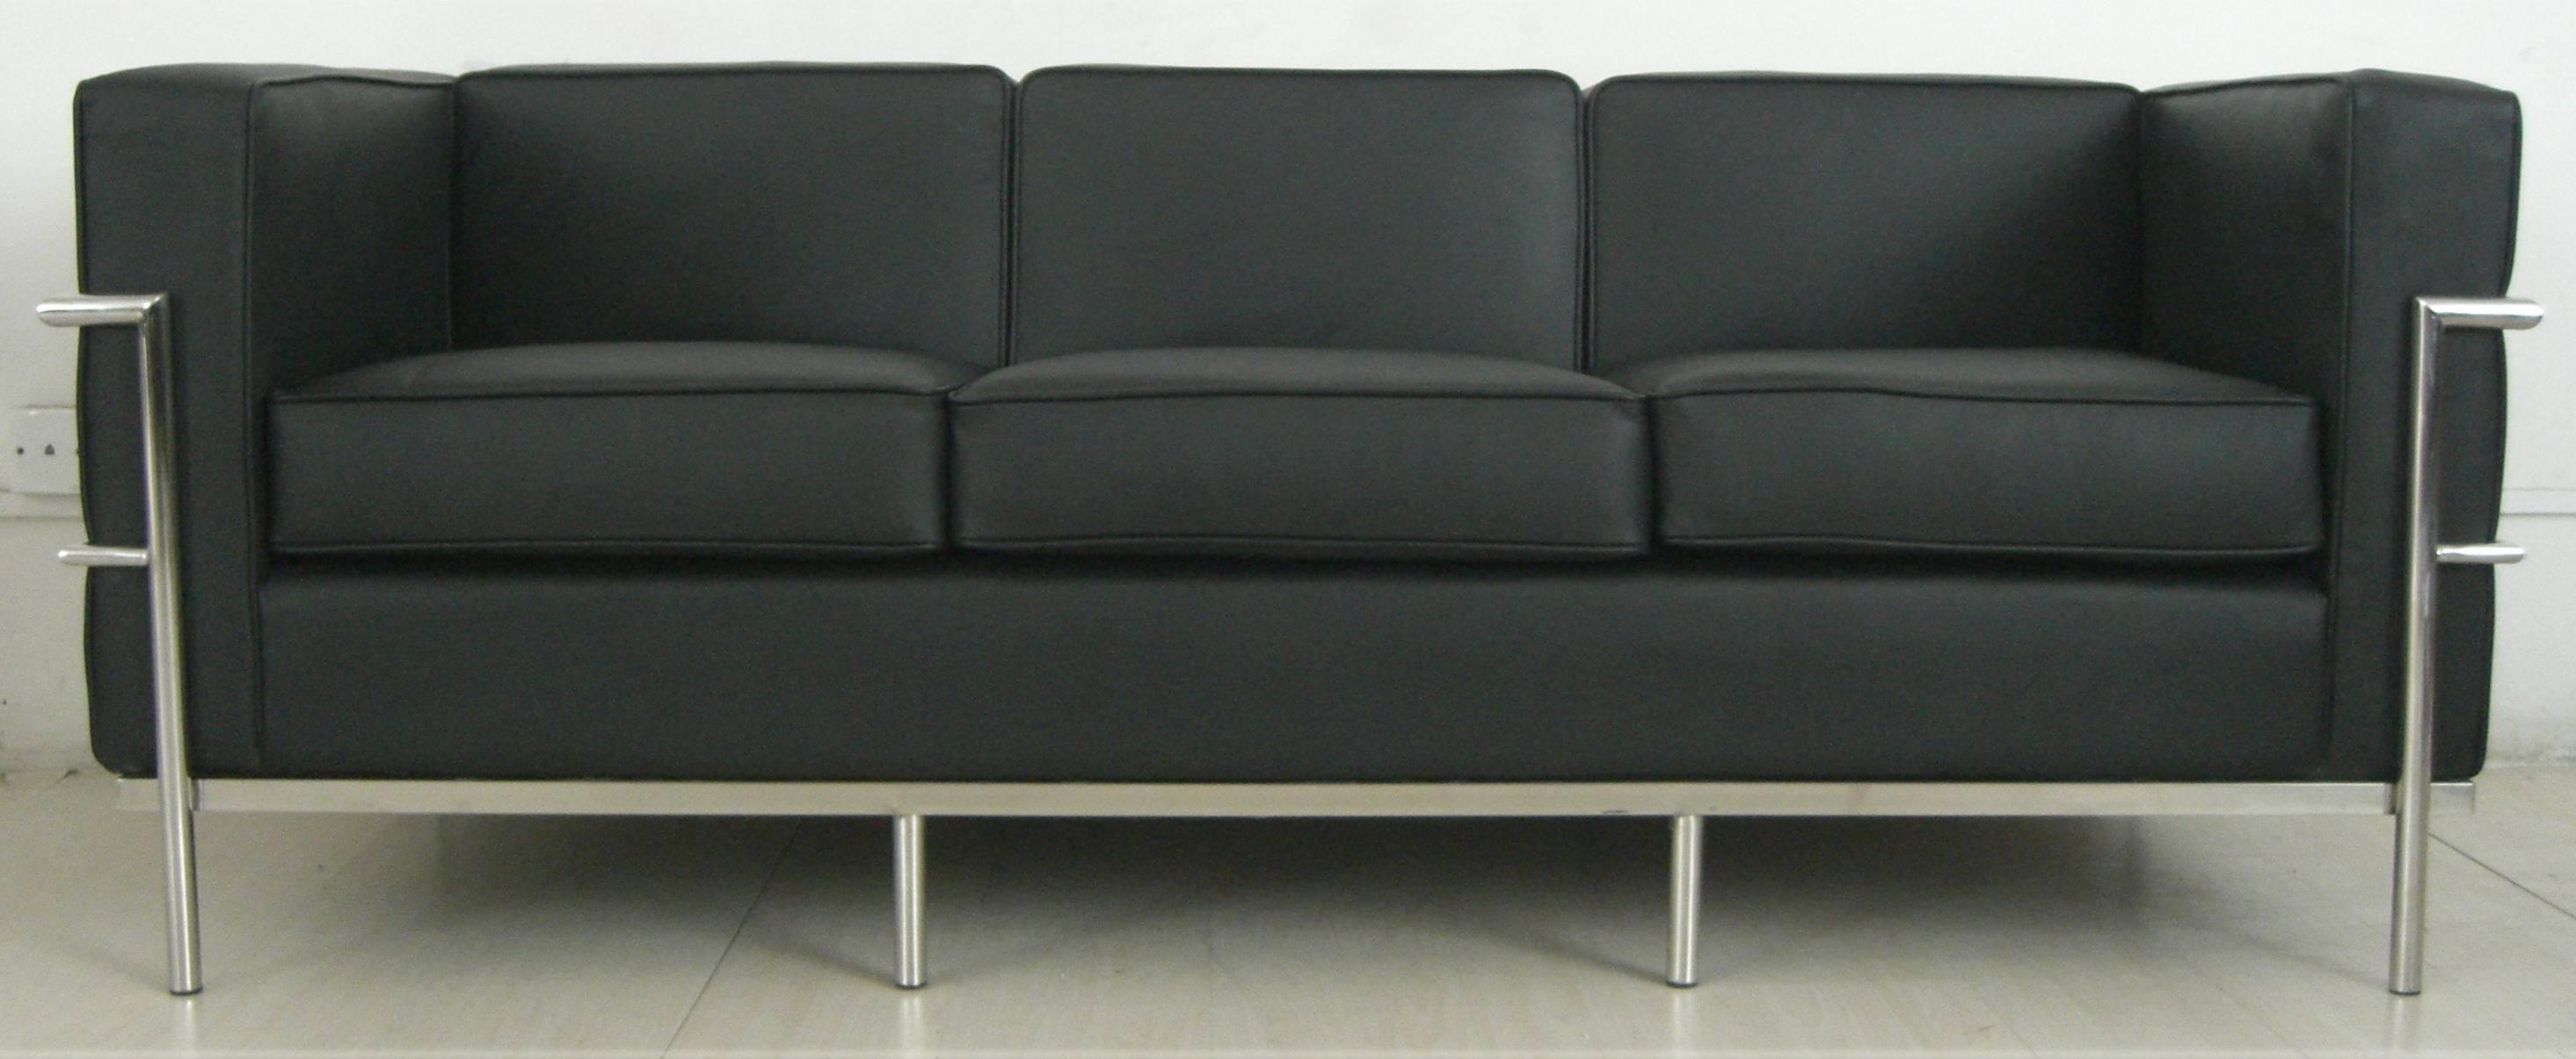 China Leather Sofa Le Corbusier Lc2